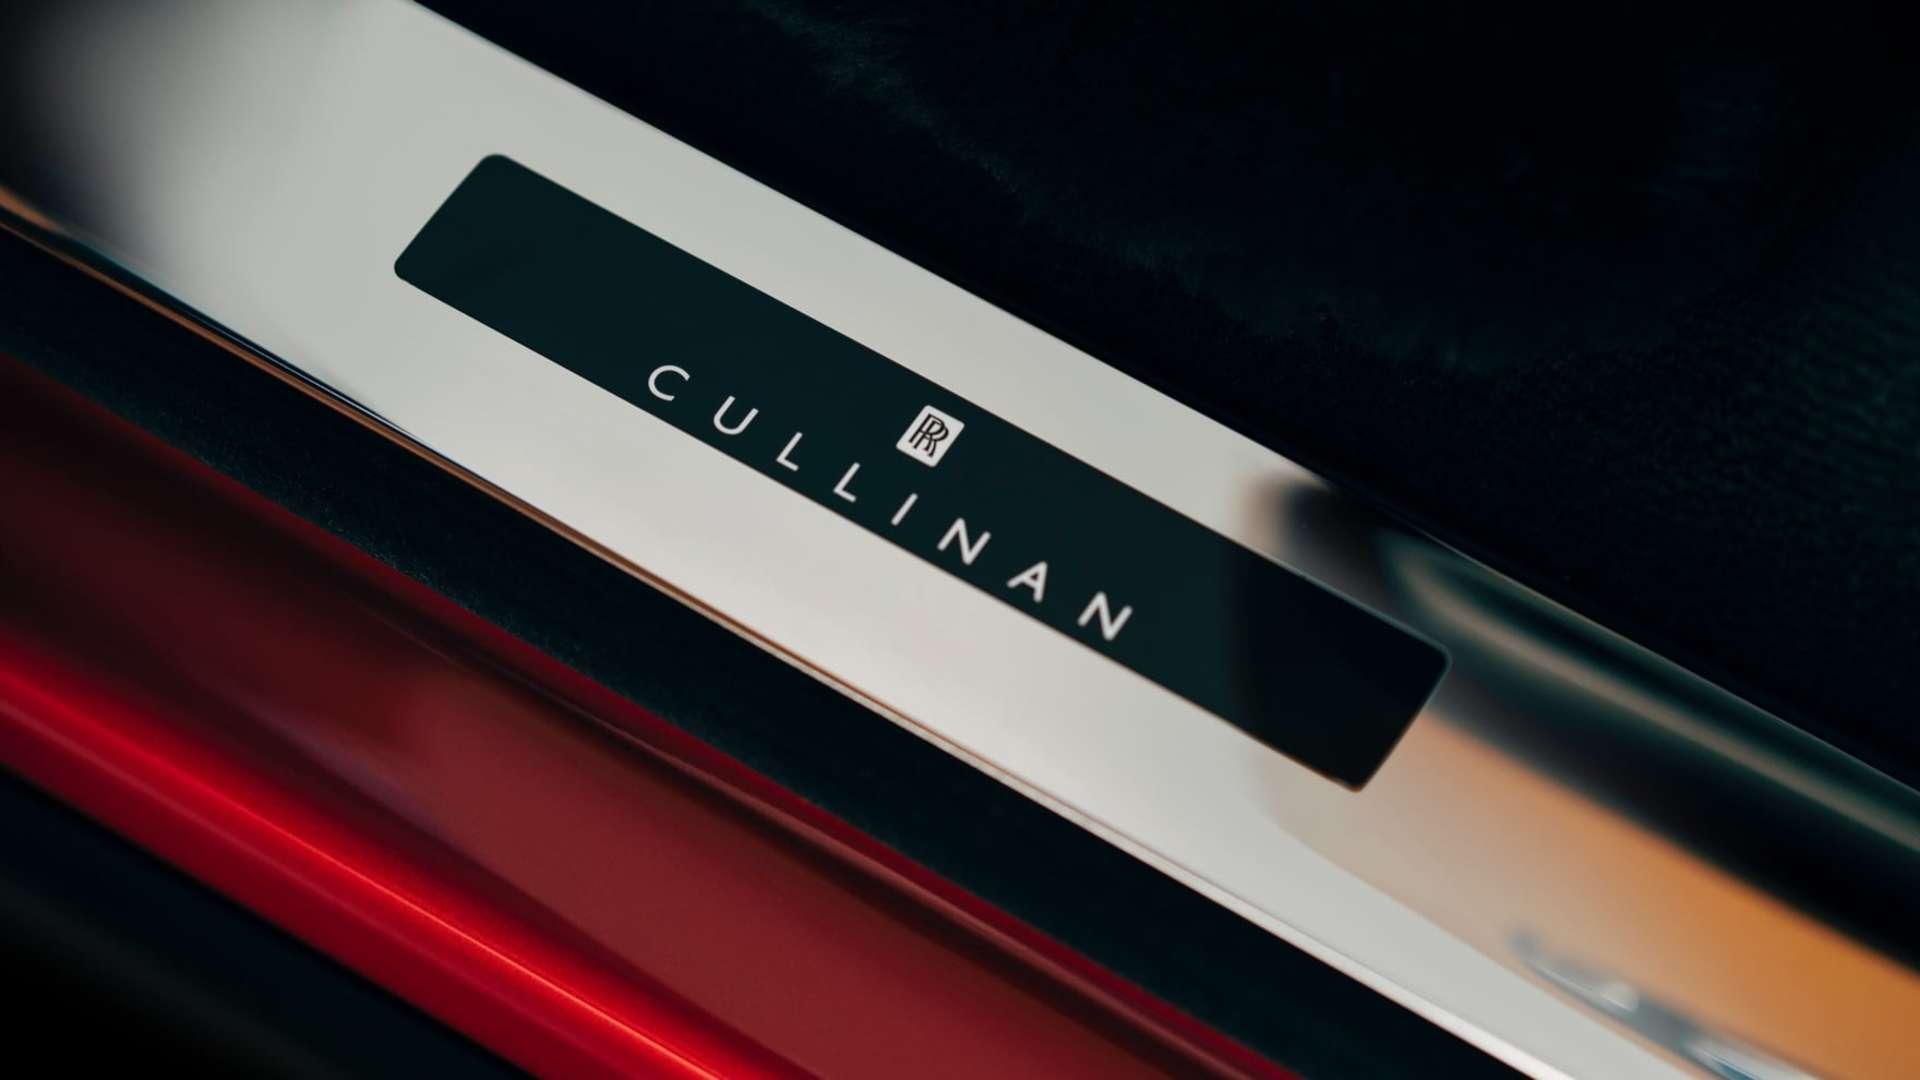 The tread plates on a red Rolls-Royce Cullinan motor car